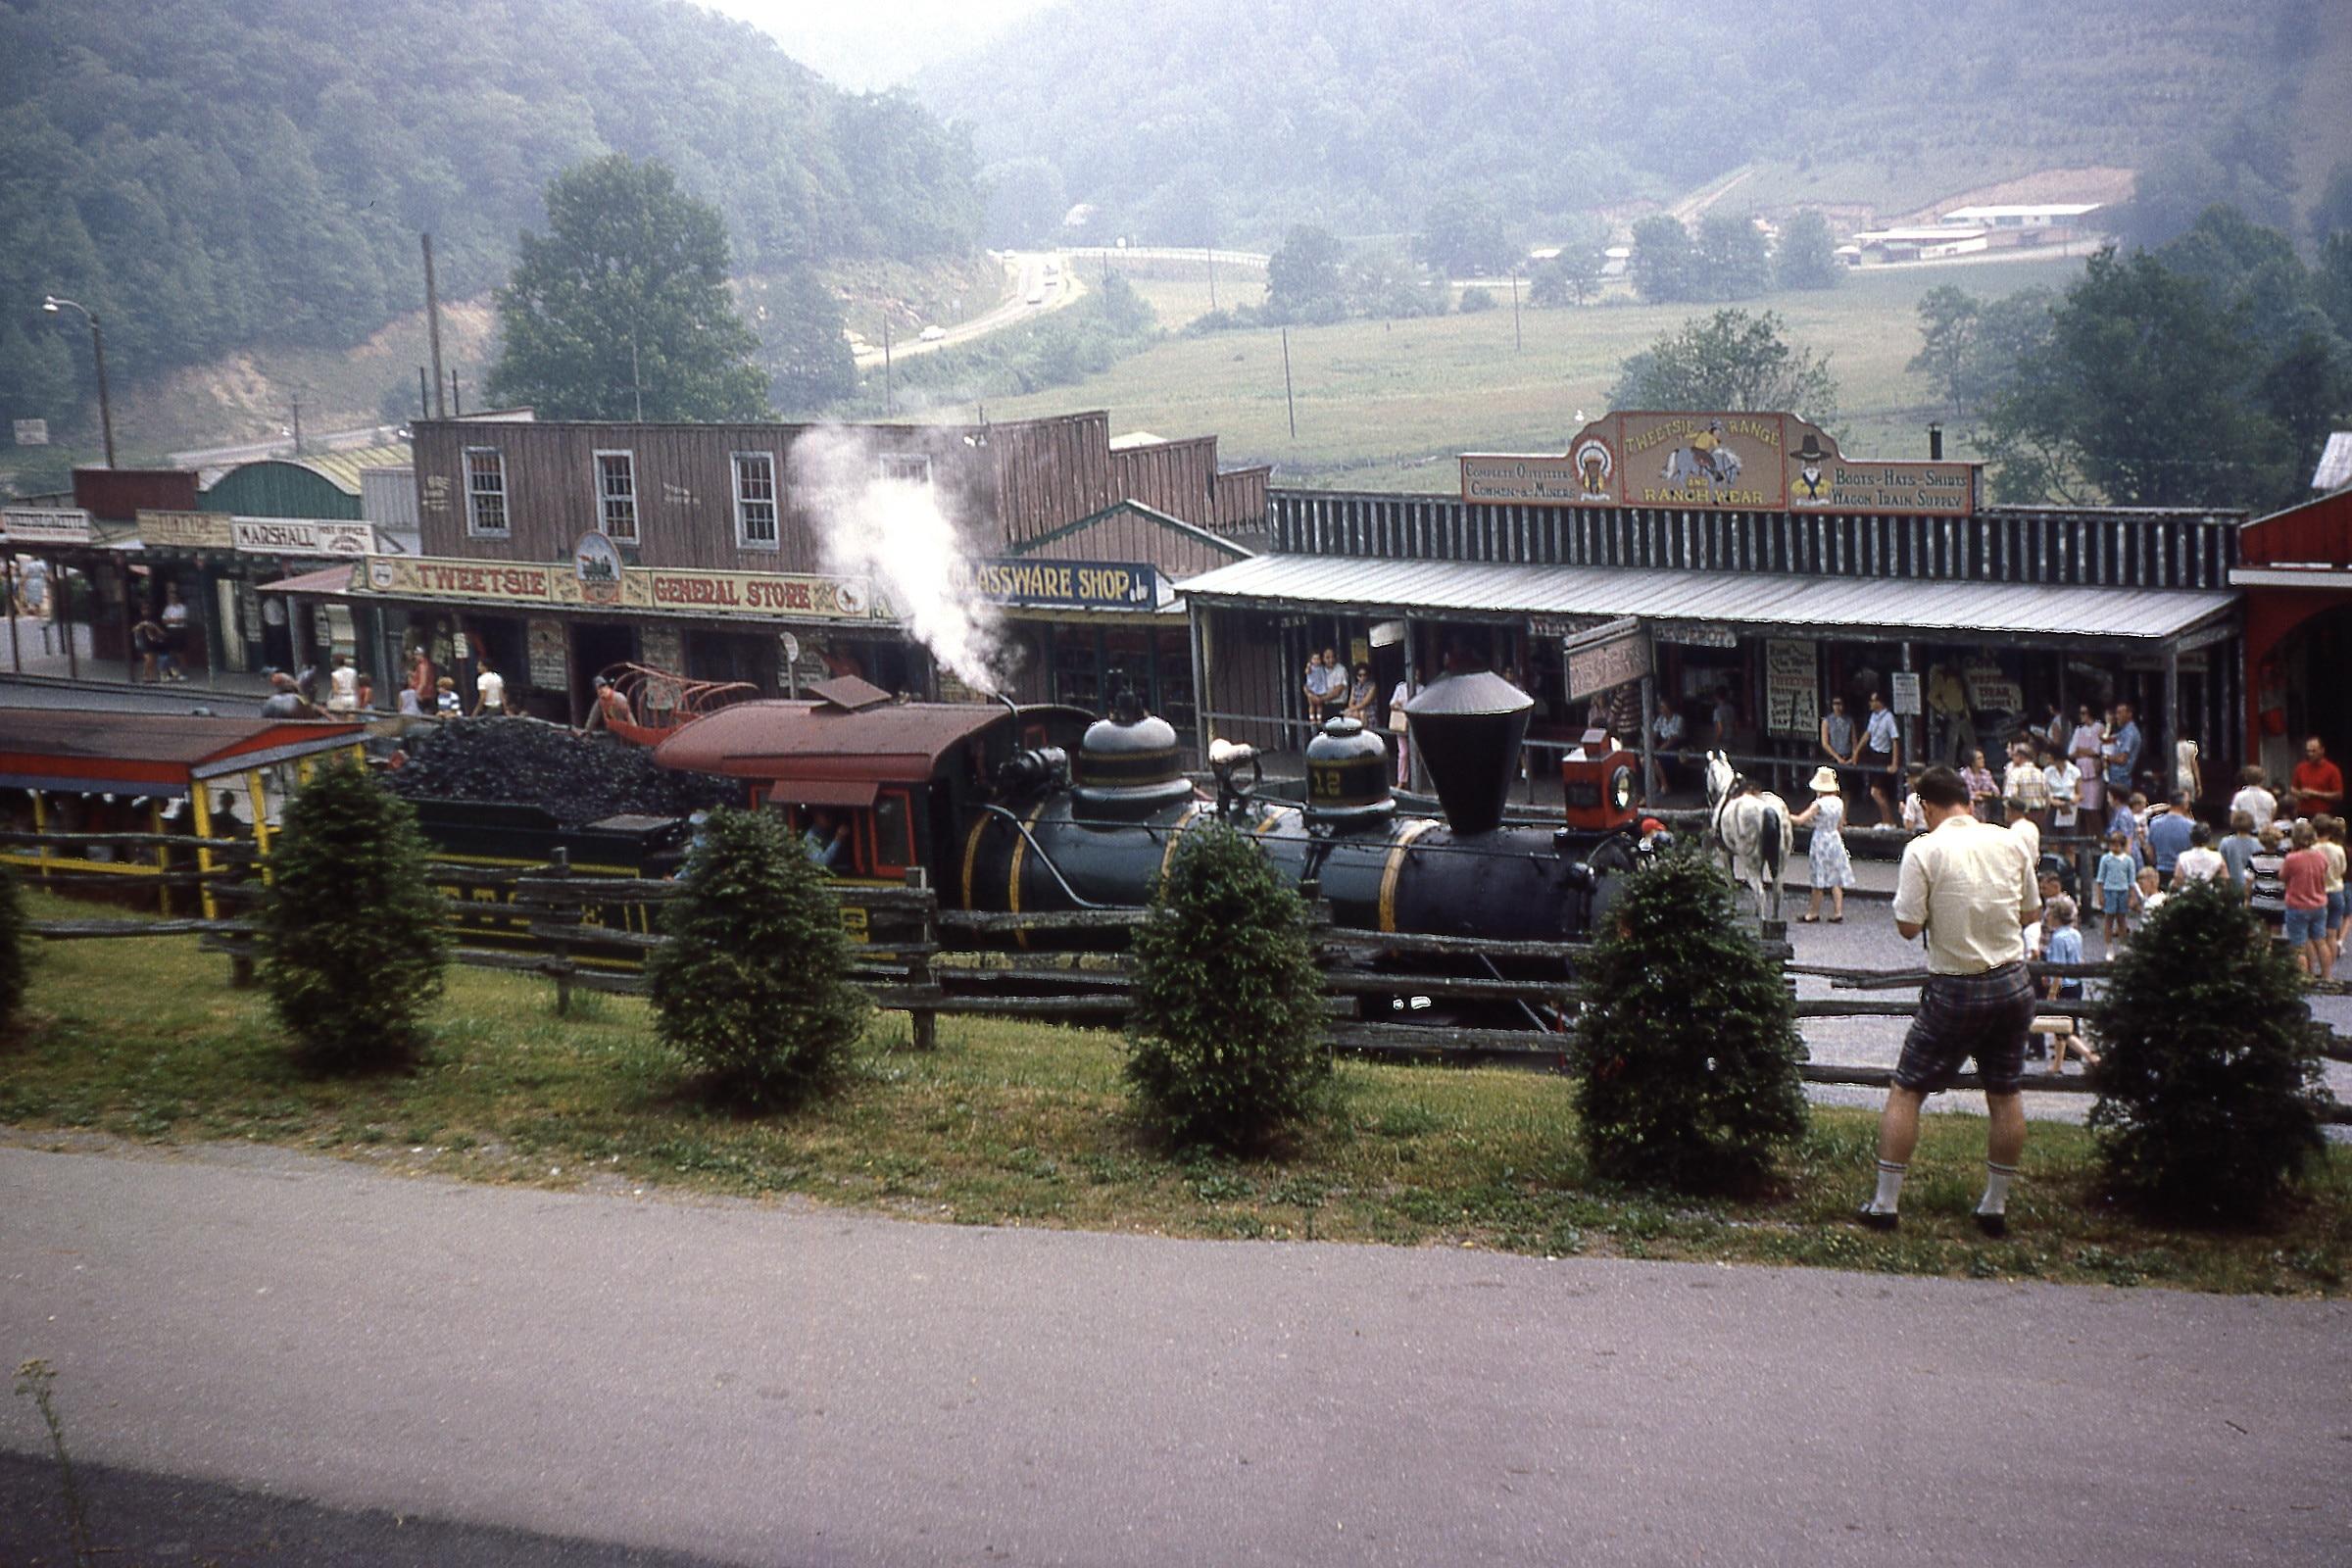 Tweetsie Railroad, Blowing Rock, North Carolina, United States of America